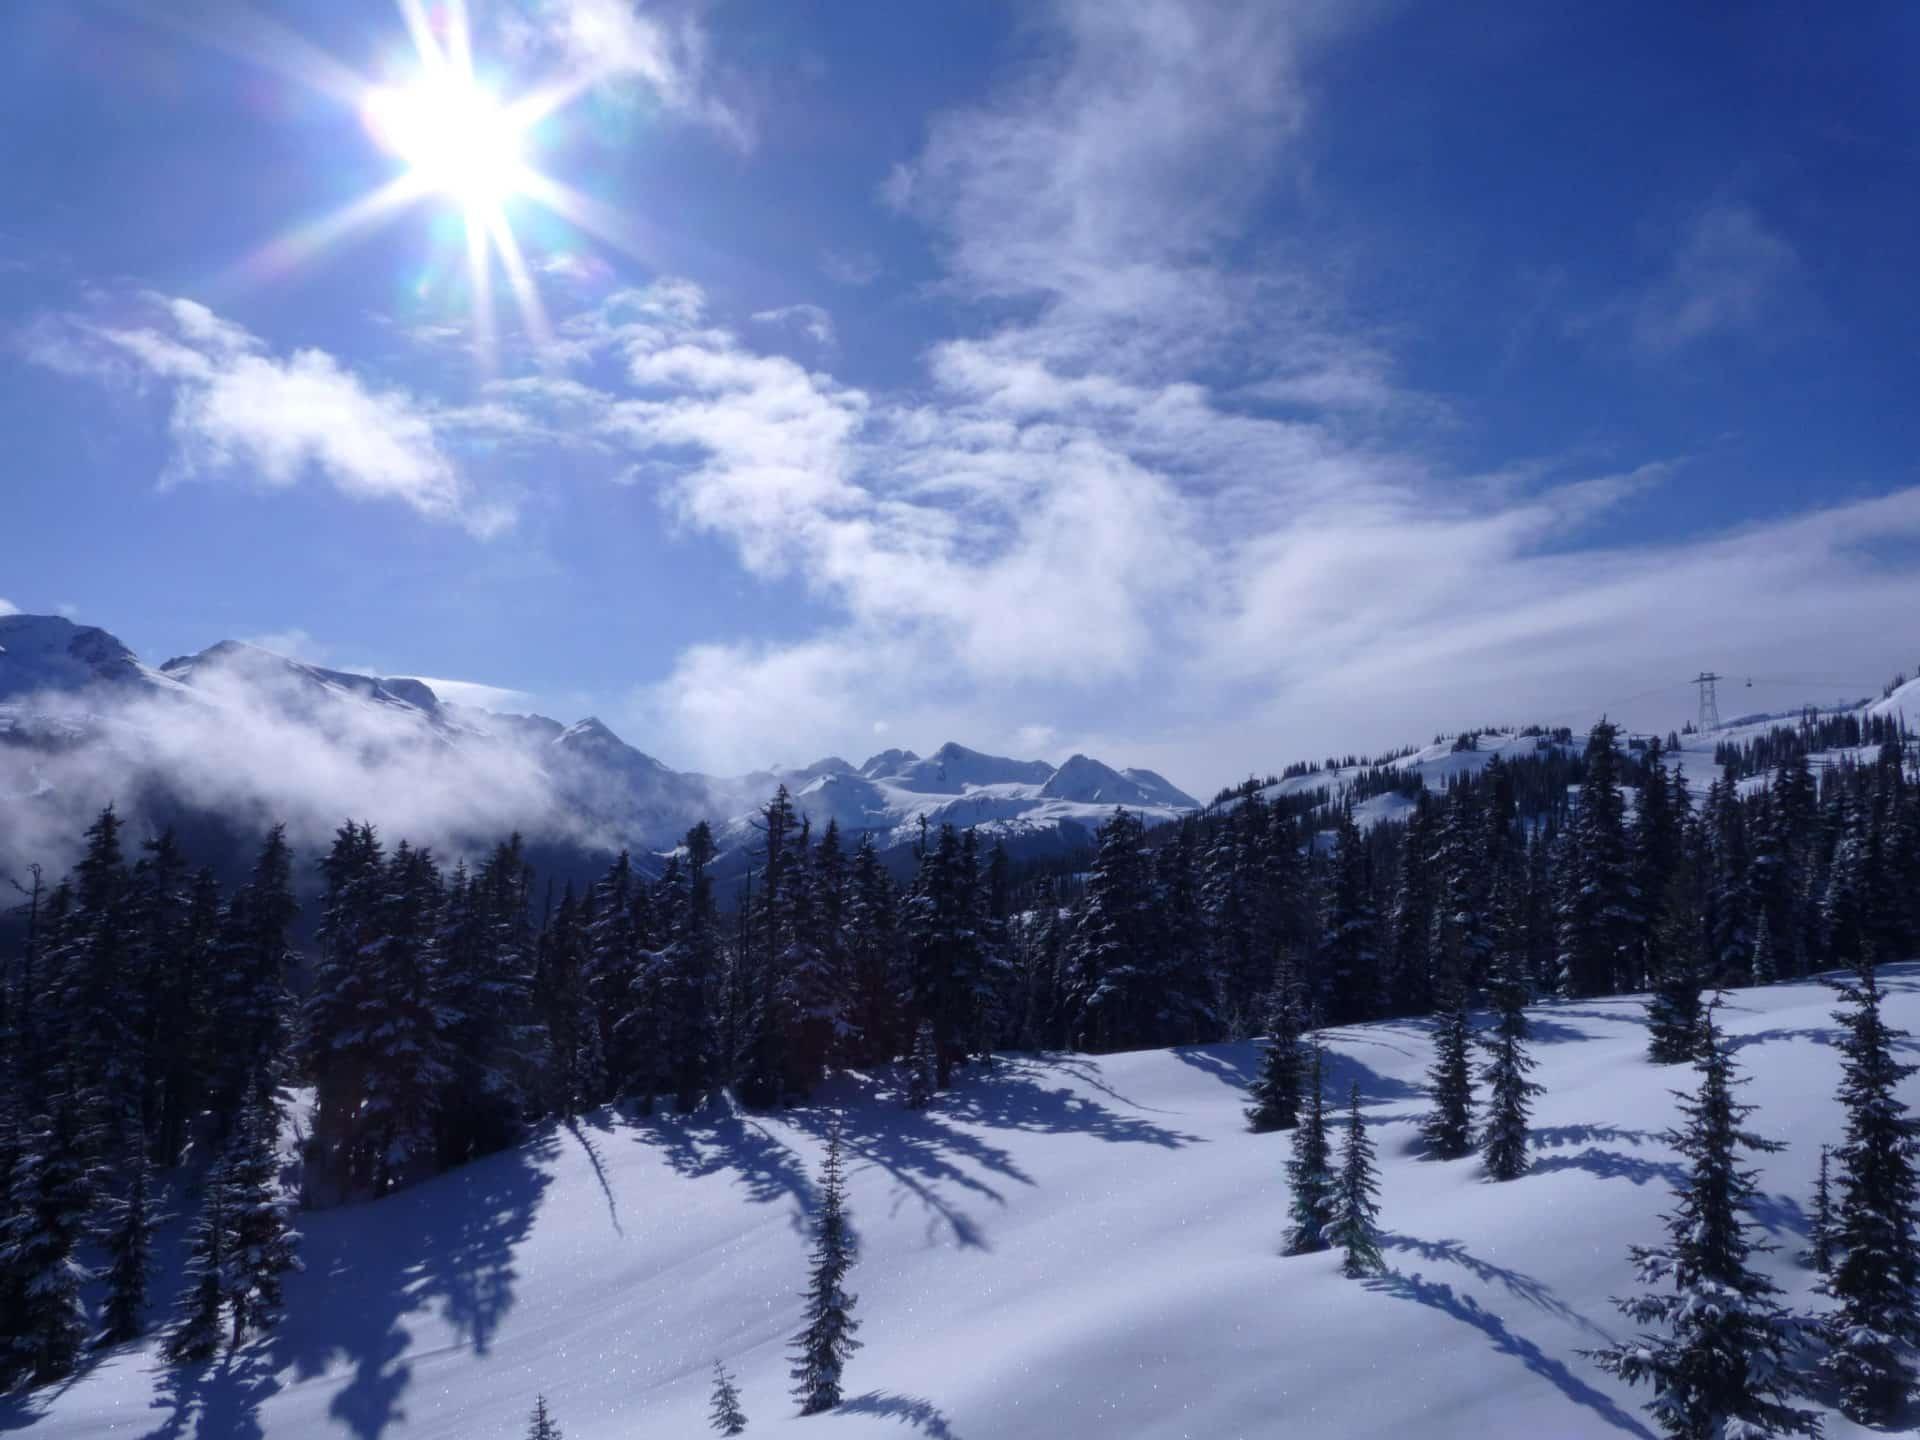 Backcountry ski touring in Whistler, BC